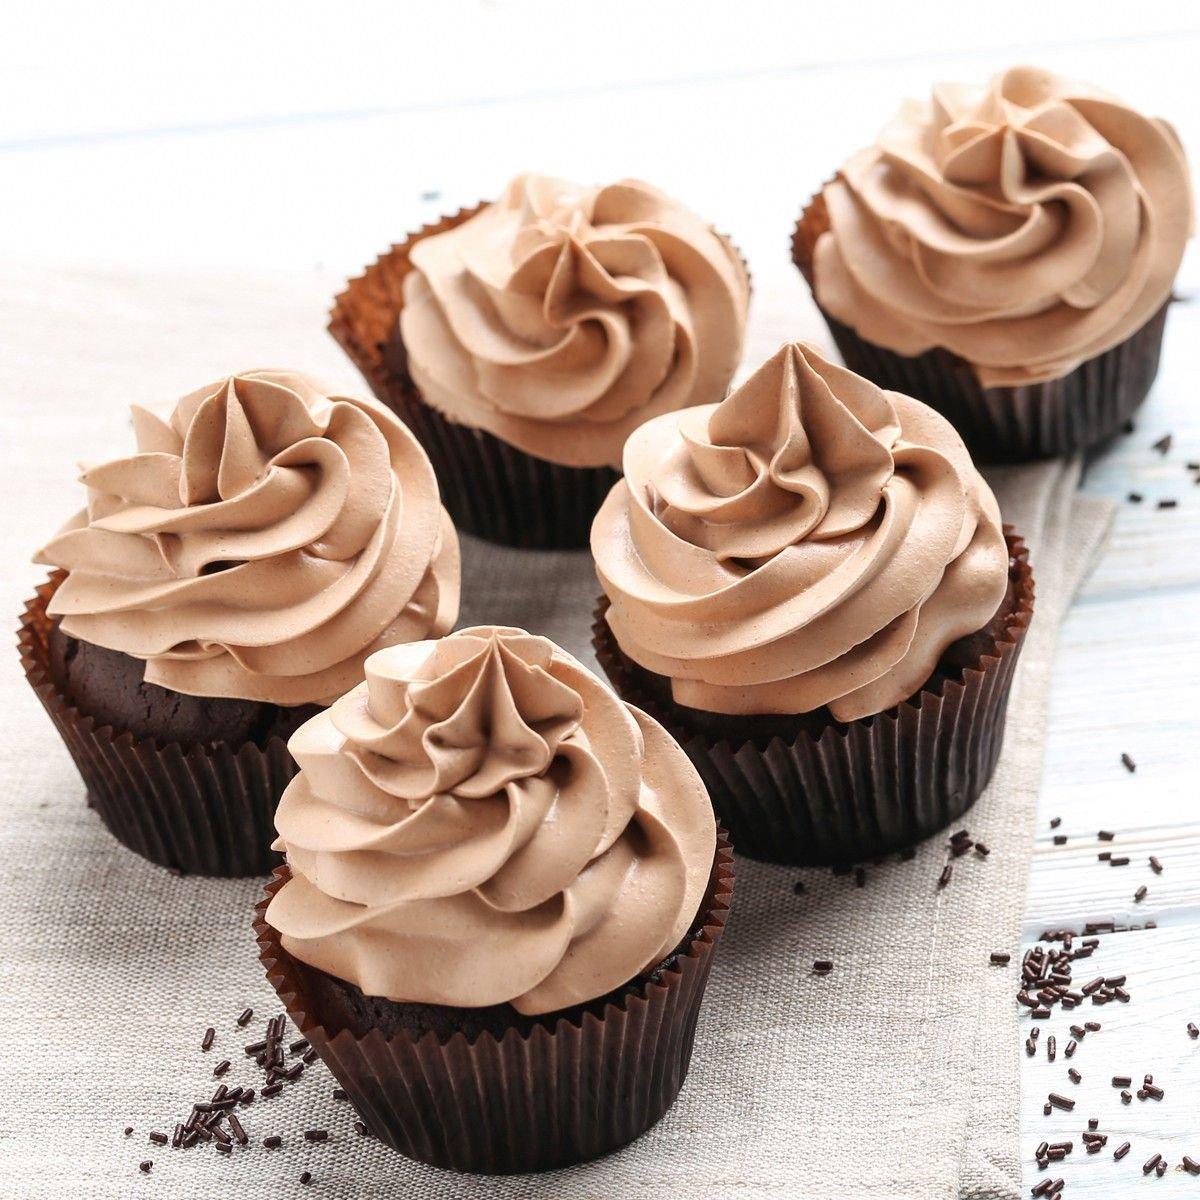 FunCakes Mix for ENCHANTED CREAM CHOCO 450γρ Μείγμα για Απαλή Βελούδινη Κρέμα με Γεύση Σοκολάτας